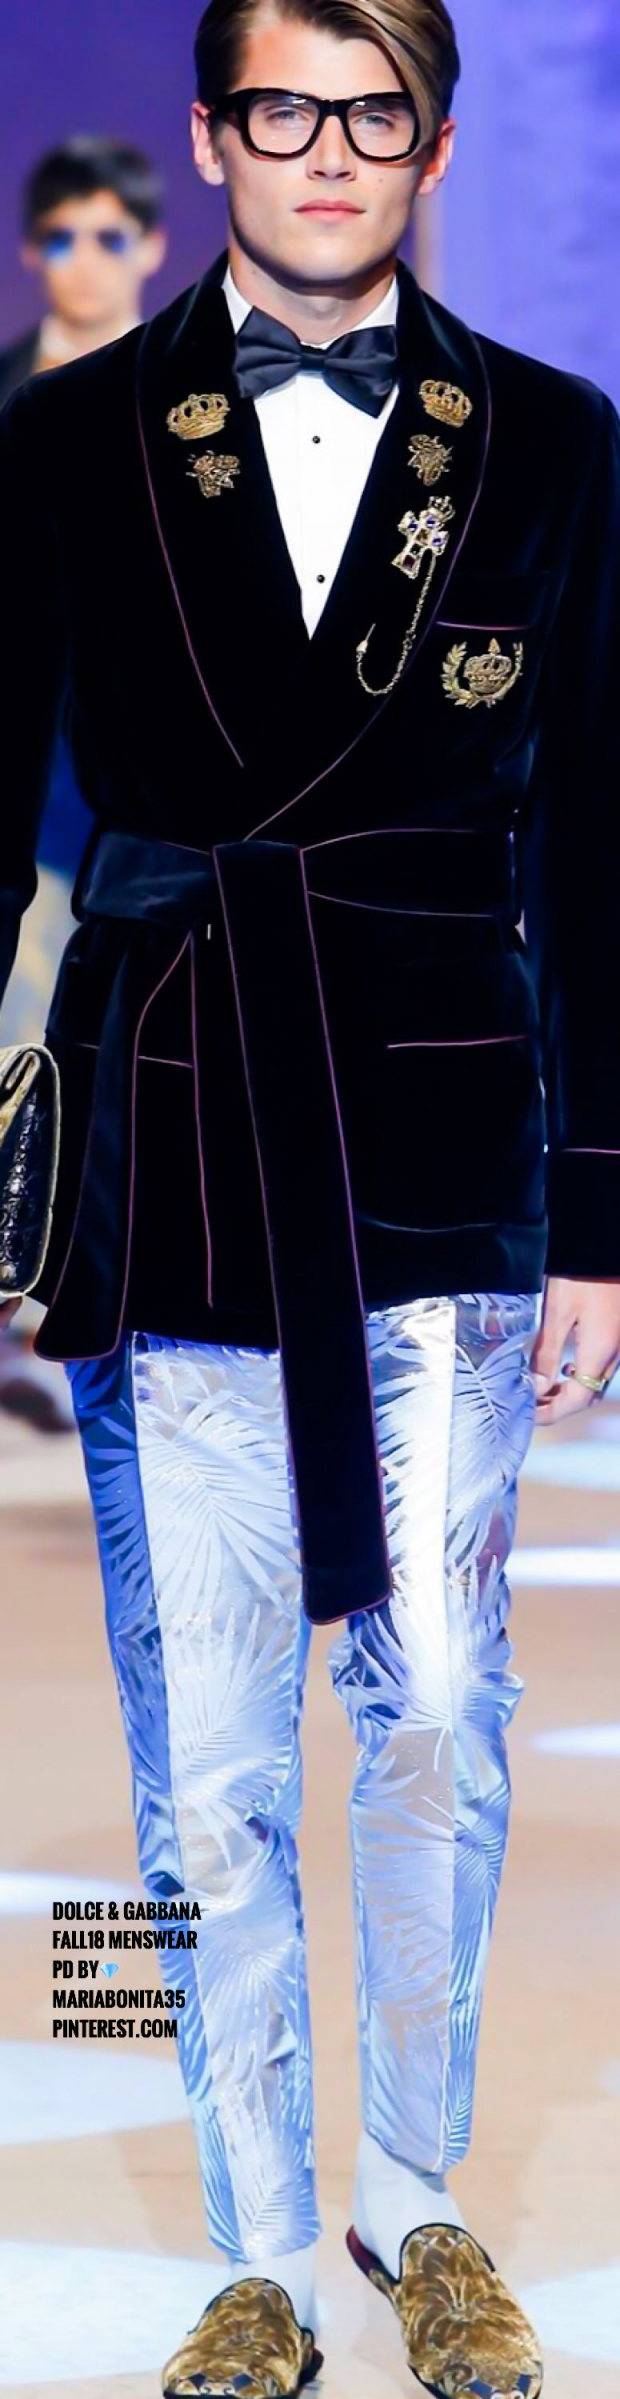 Dolce & Gabbana #suitvest #suit #vest #runway